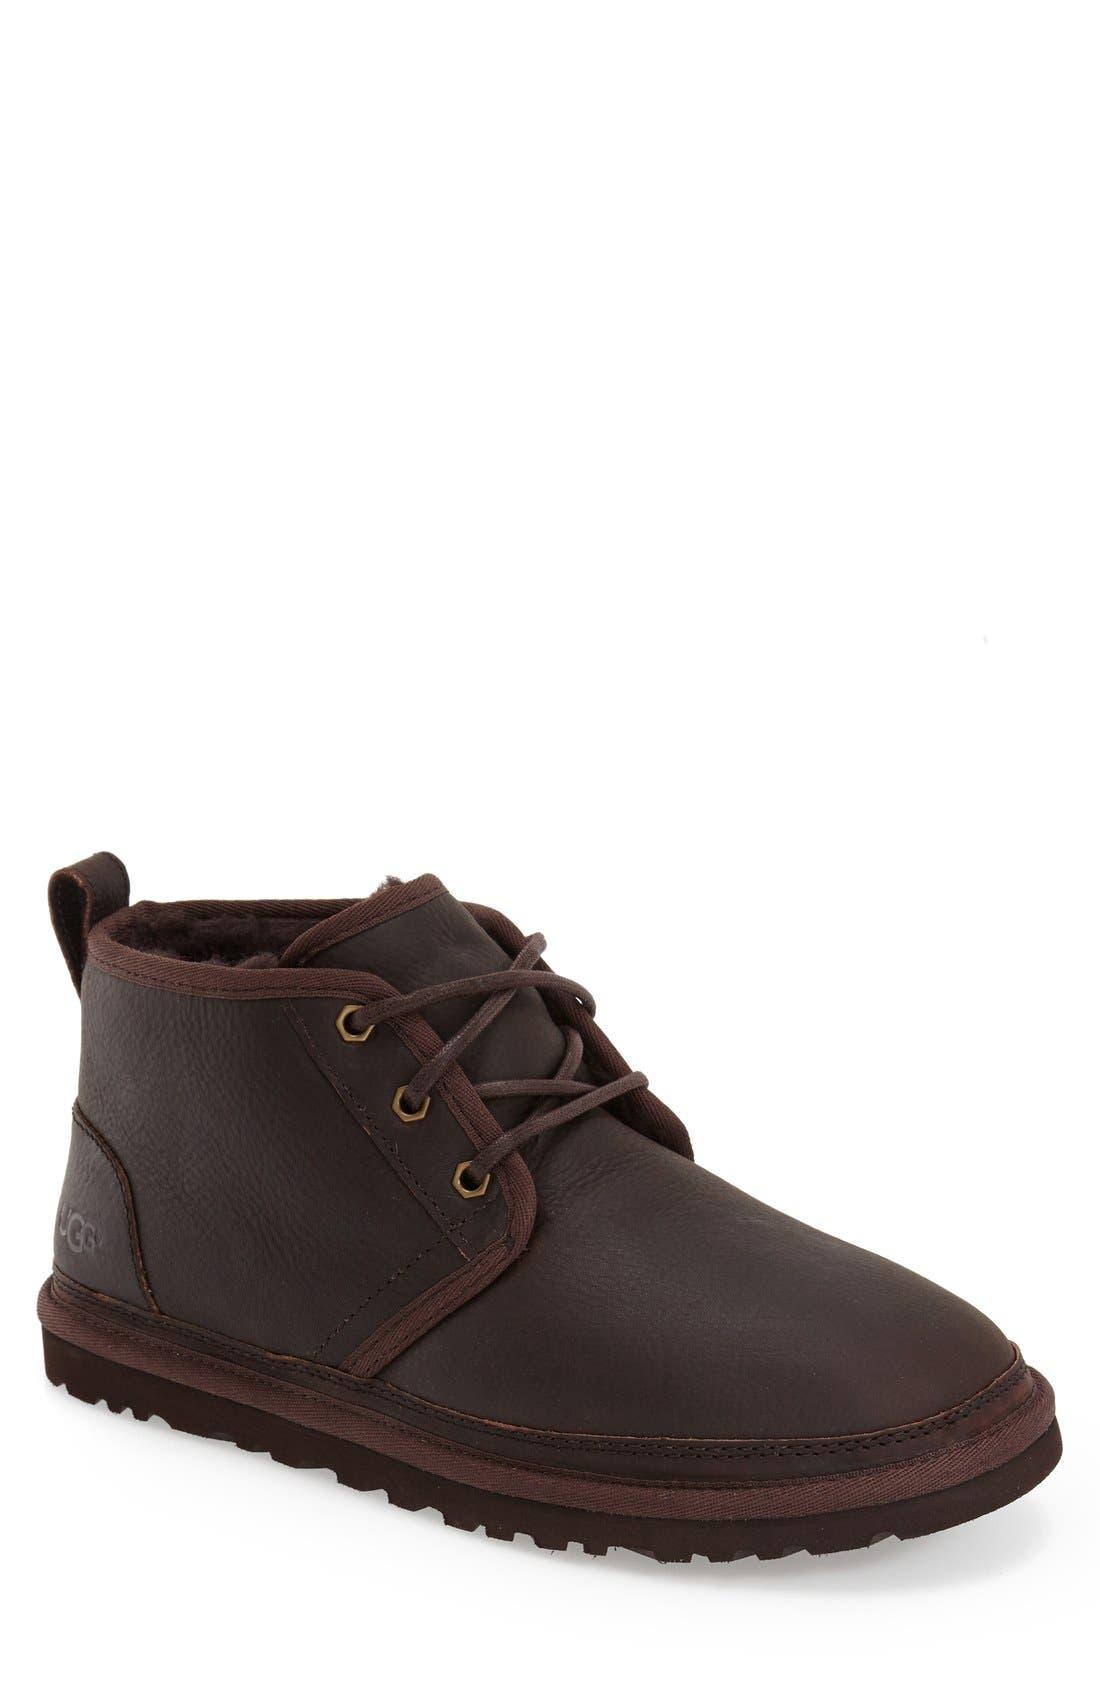 Neumel Chukka Boot,                         Main,                         color, 203